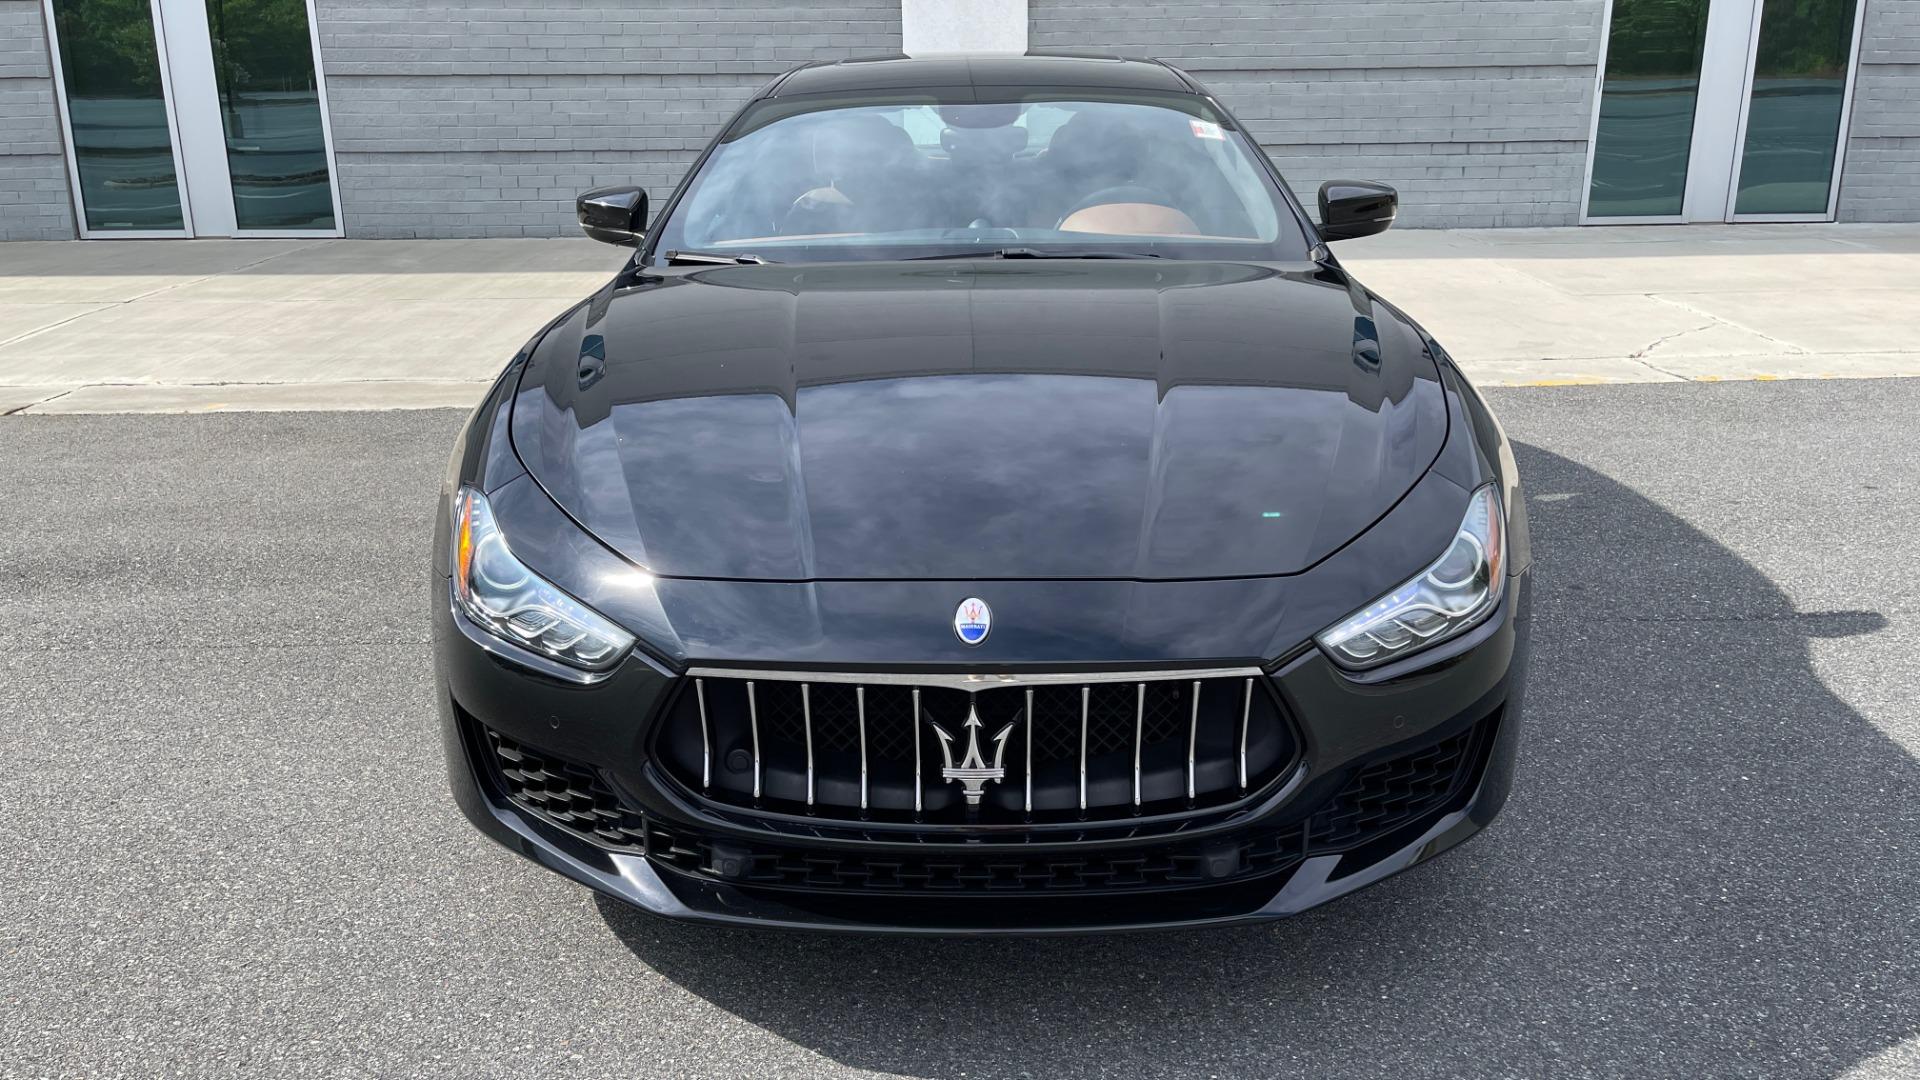 Used 2018 Maserati GHIBLI 3.0L SEDAN / 8-SPD AUTO / NAV / SUNROOF / REARVIEW for sale $42,995 at Formula Imports in Charlotte NC 28227 14